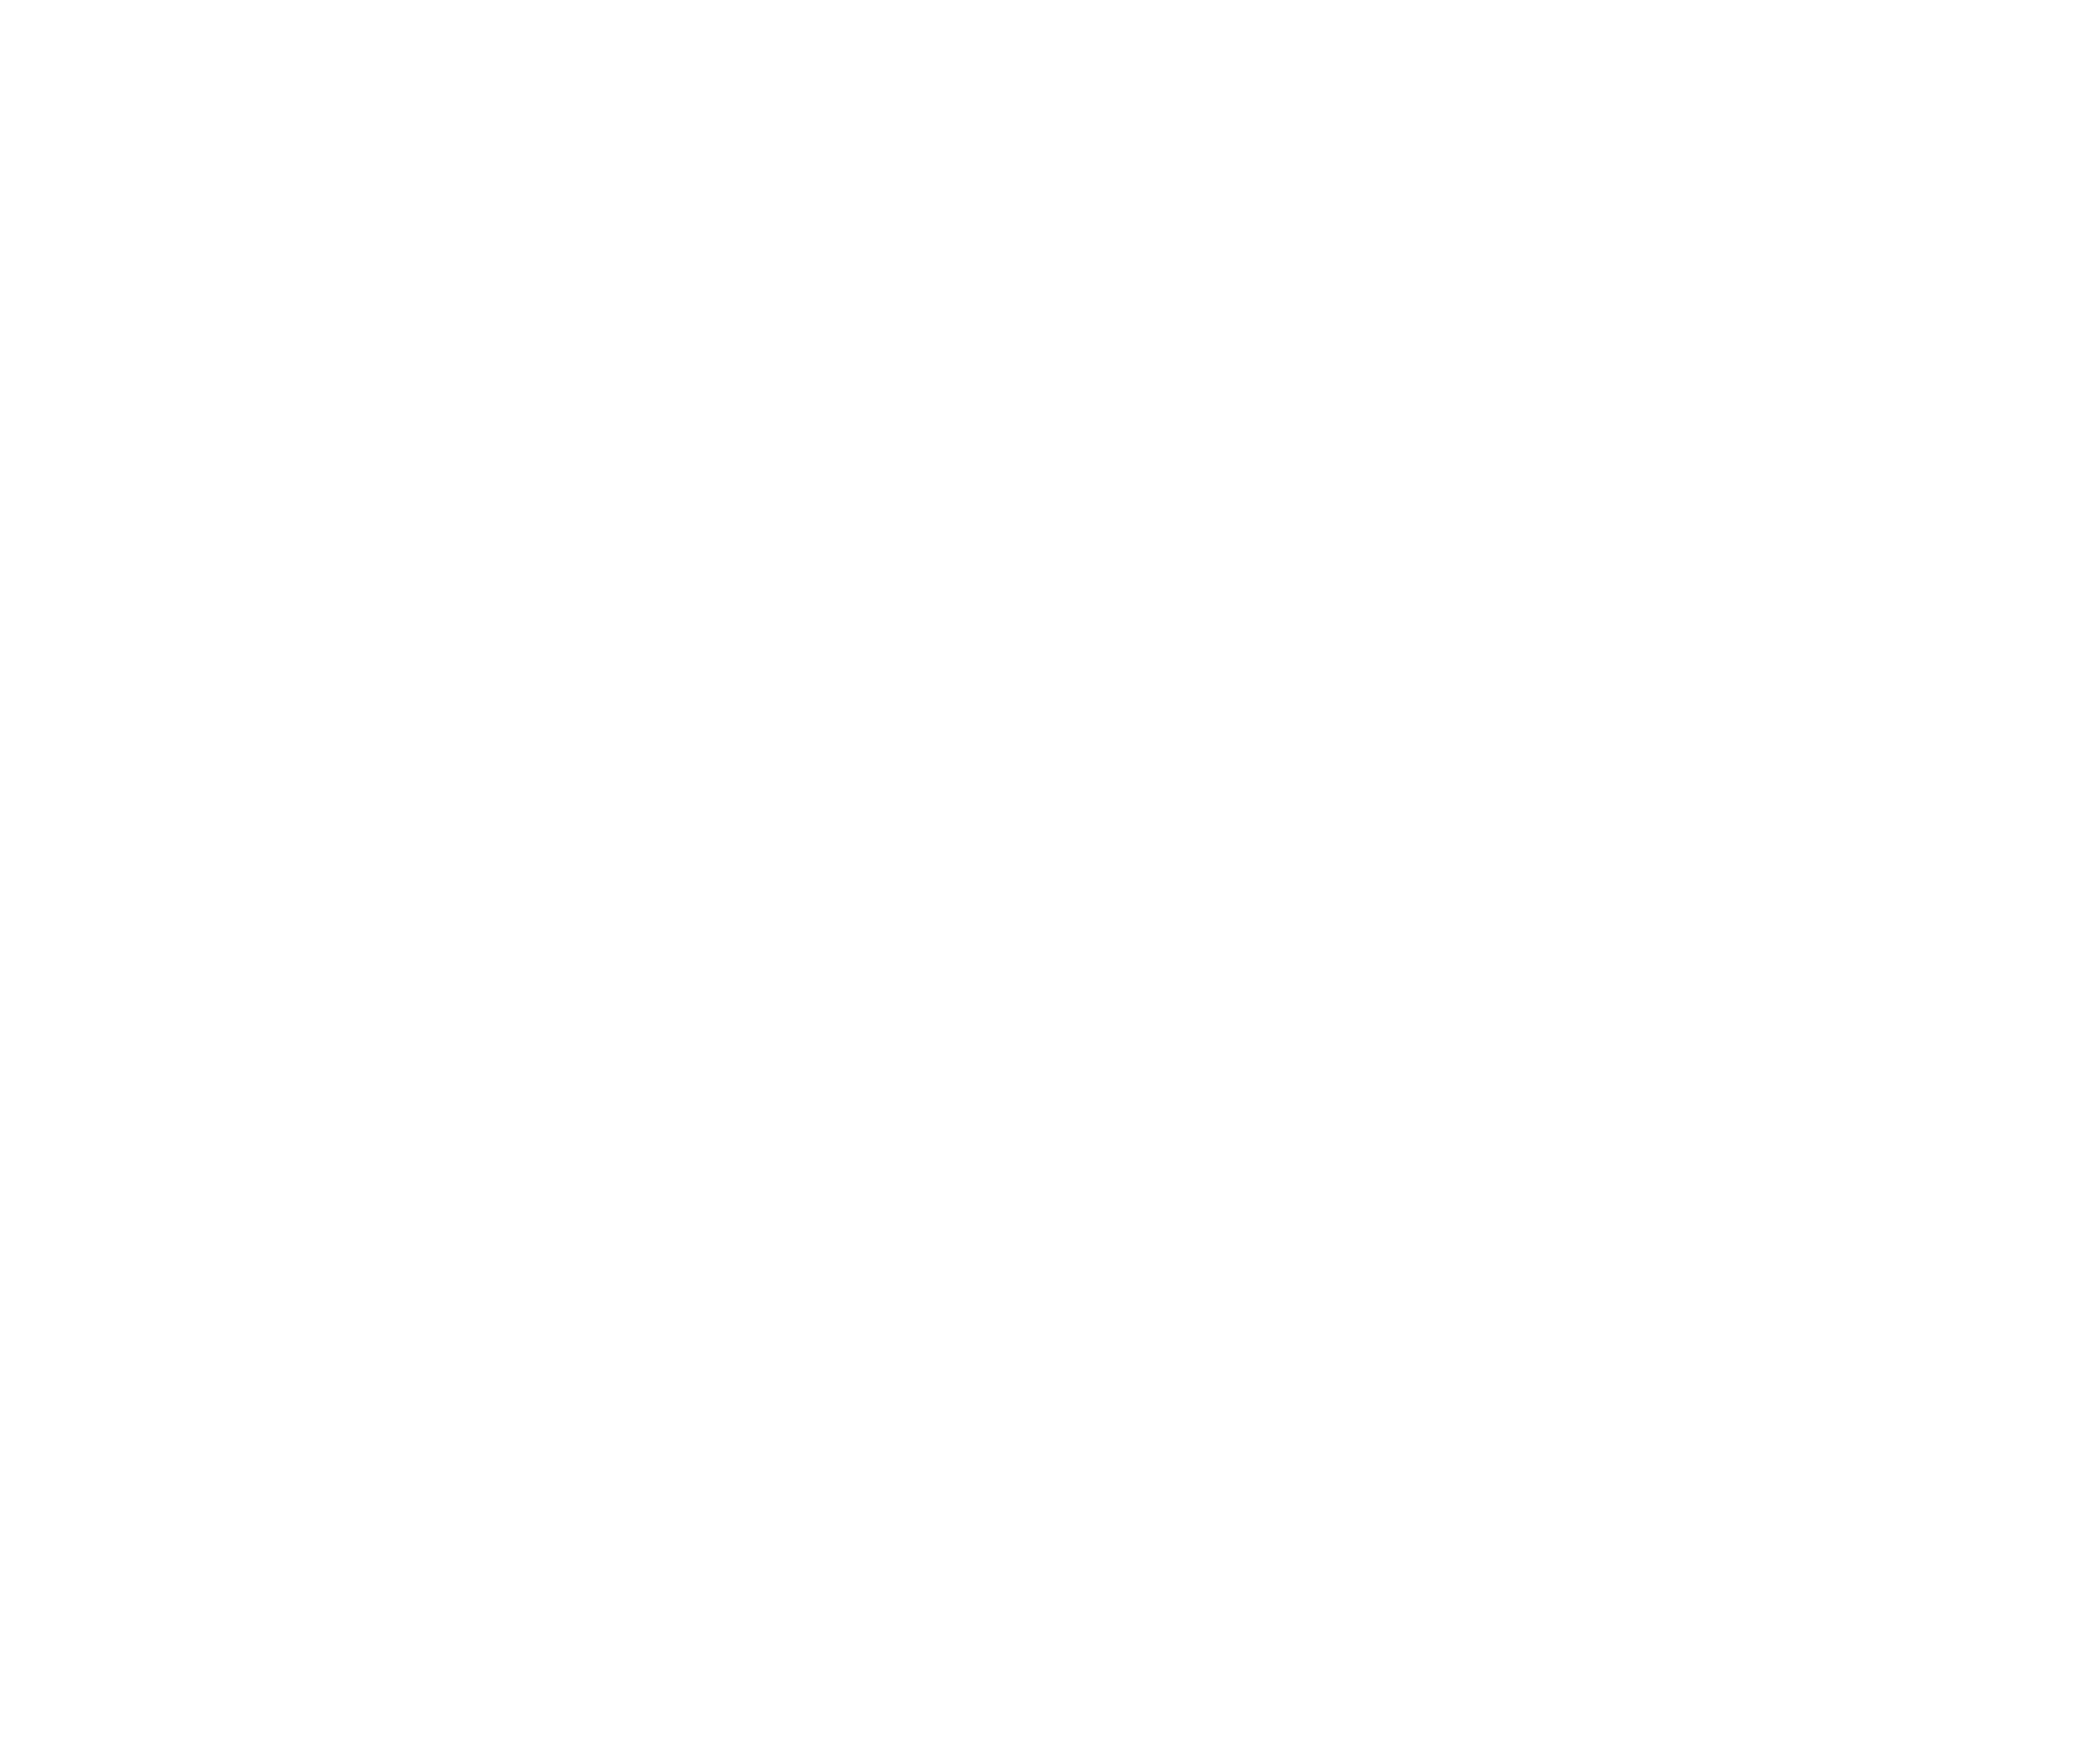 vmd_logo_2020_rev